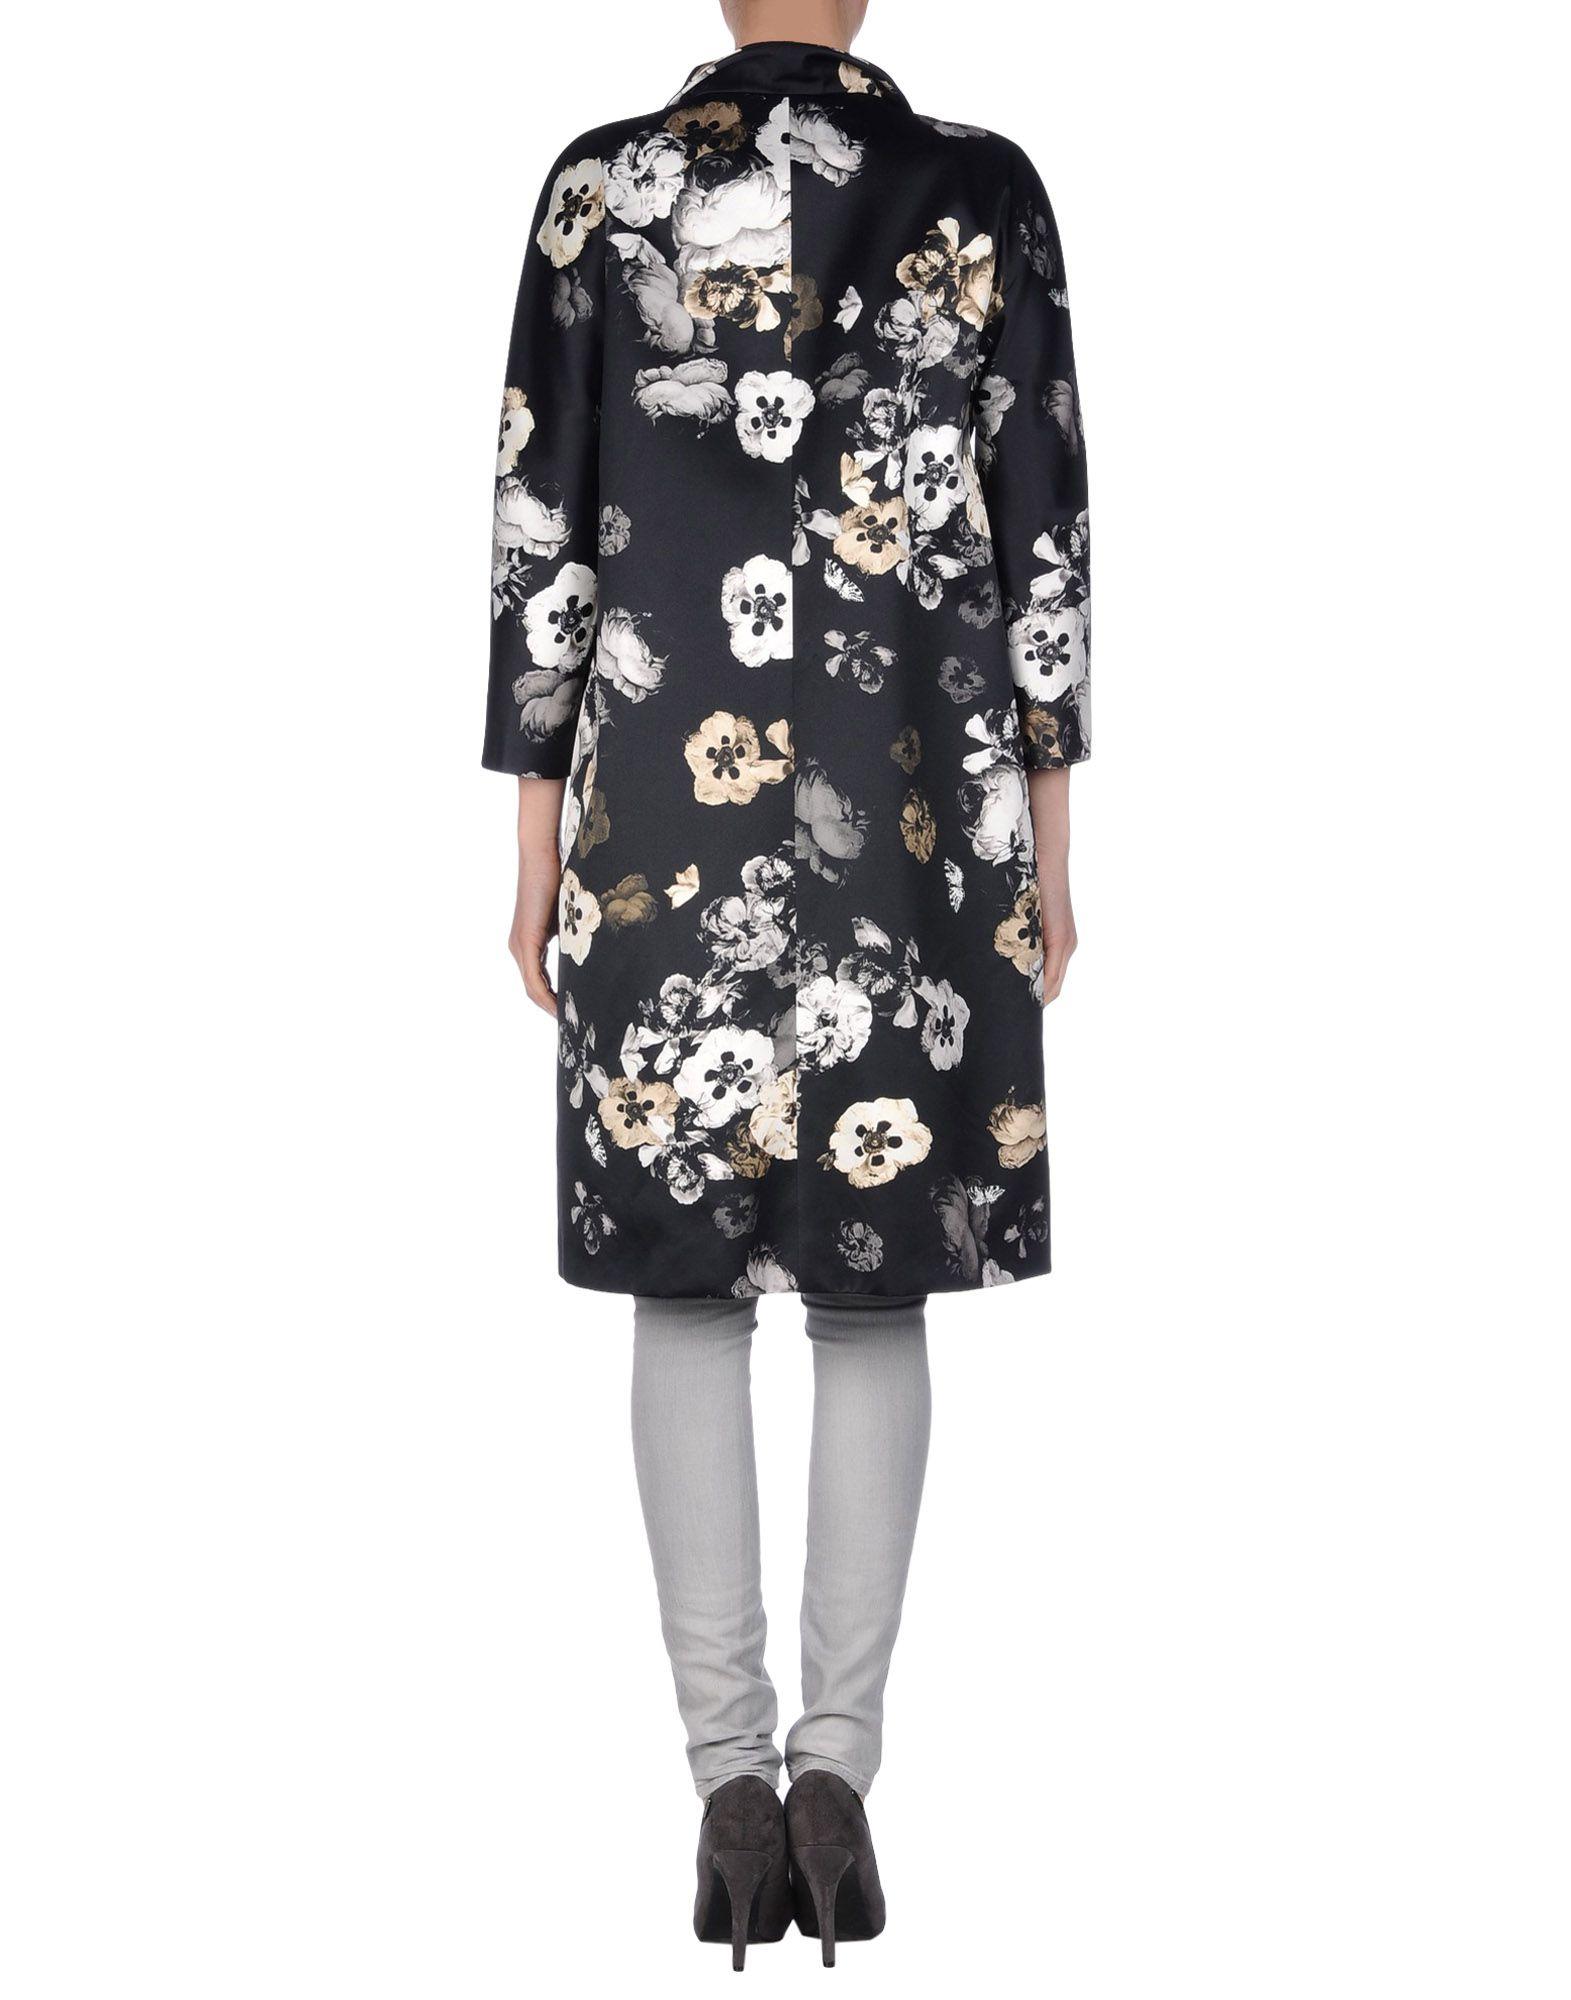 Giambattista valli Full-length Jacket in Black